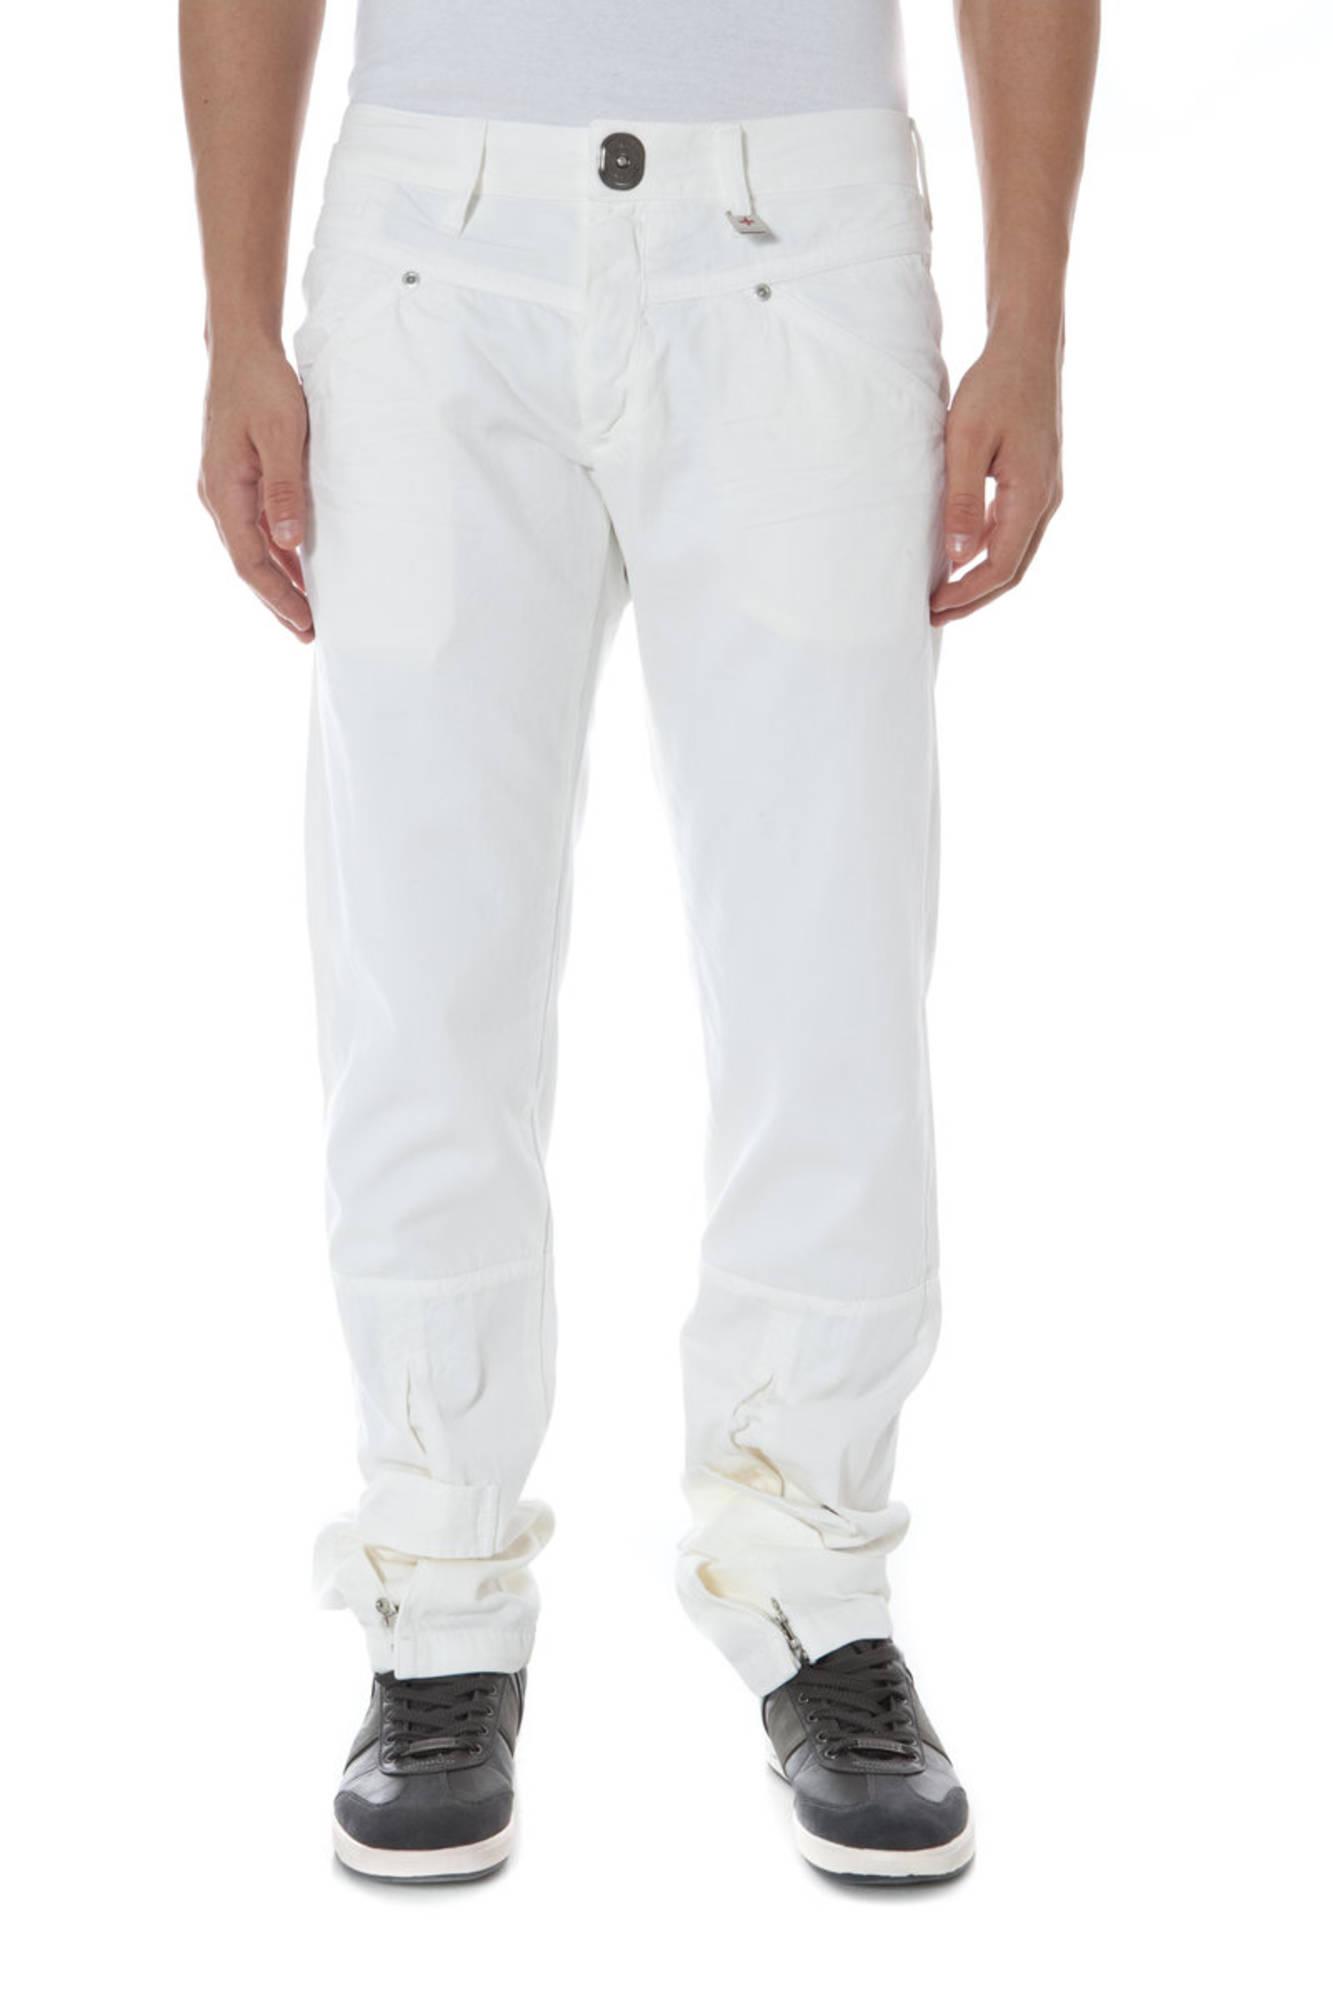 Kalhoty ZUELEMENTS kalhoty BIANCO